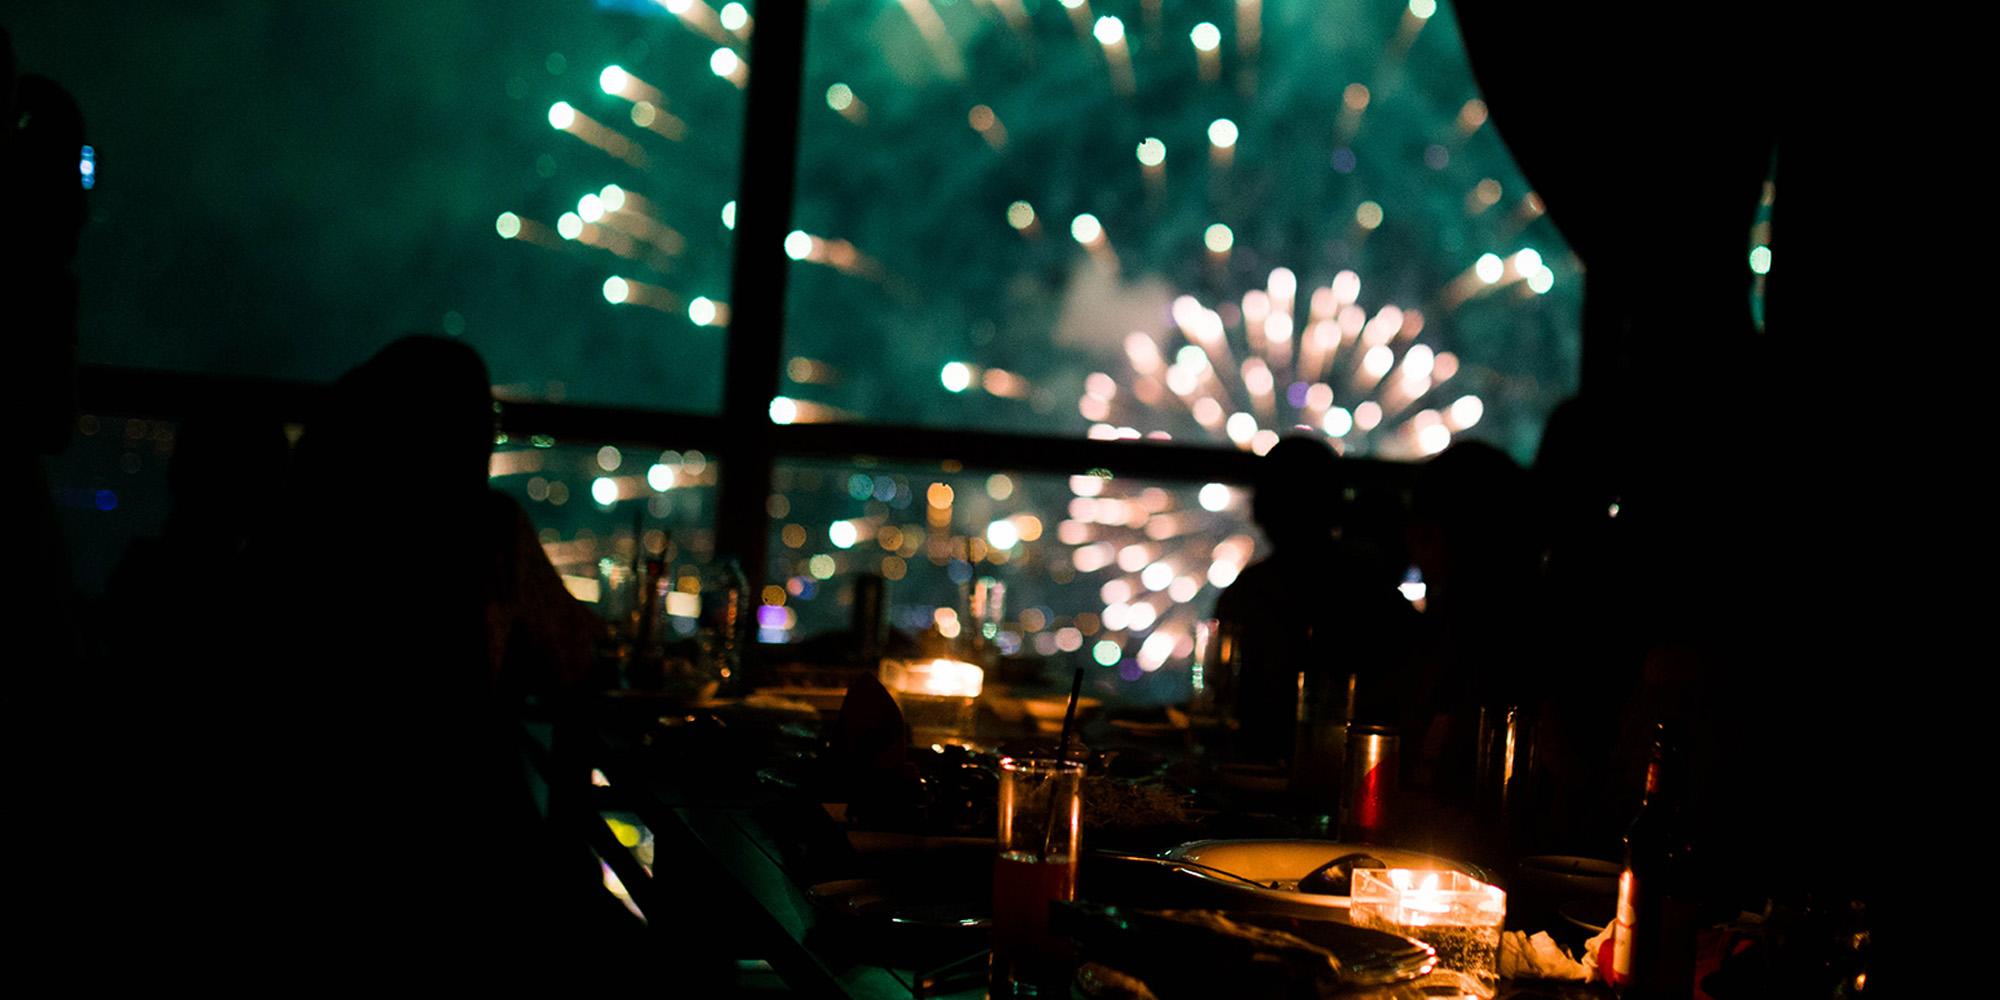 Hai Cang Restaurant Novotel Danang Enjoy Danang International Fireworks Festival From The Best Viewing Spots In Danang 01